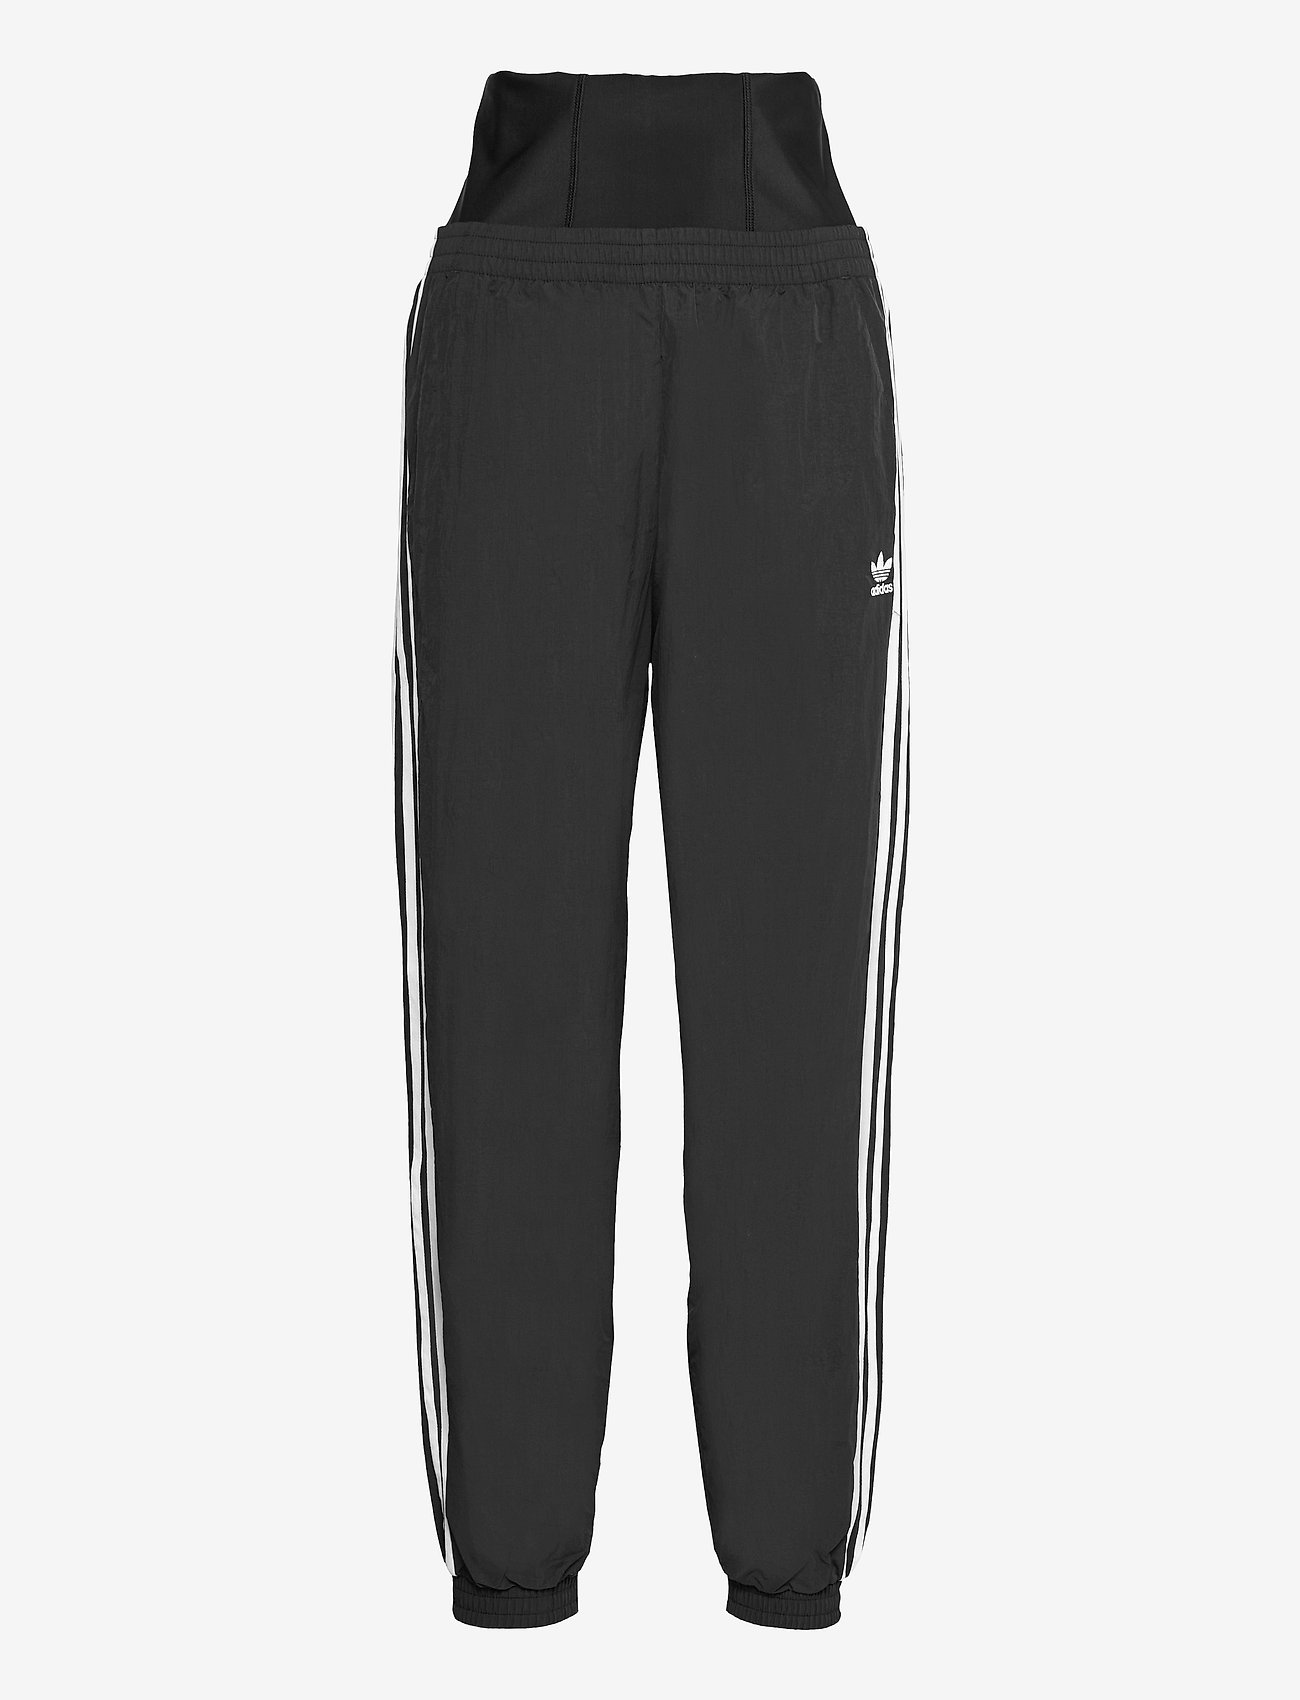 adidas Originals - Adicolor Classics Double-Waistband Fashion Track Pants W - trainingsbroek - black - 1